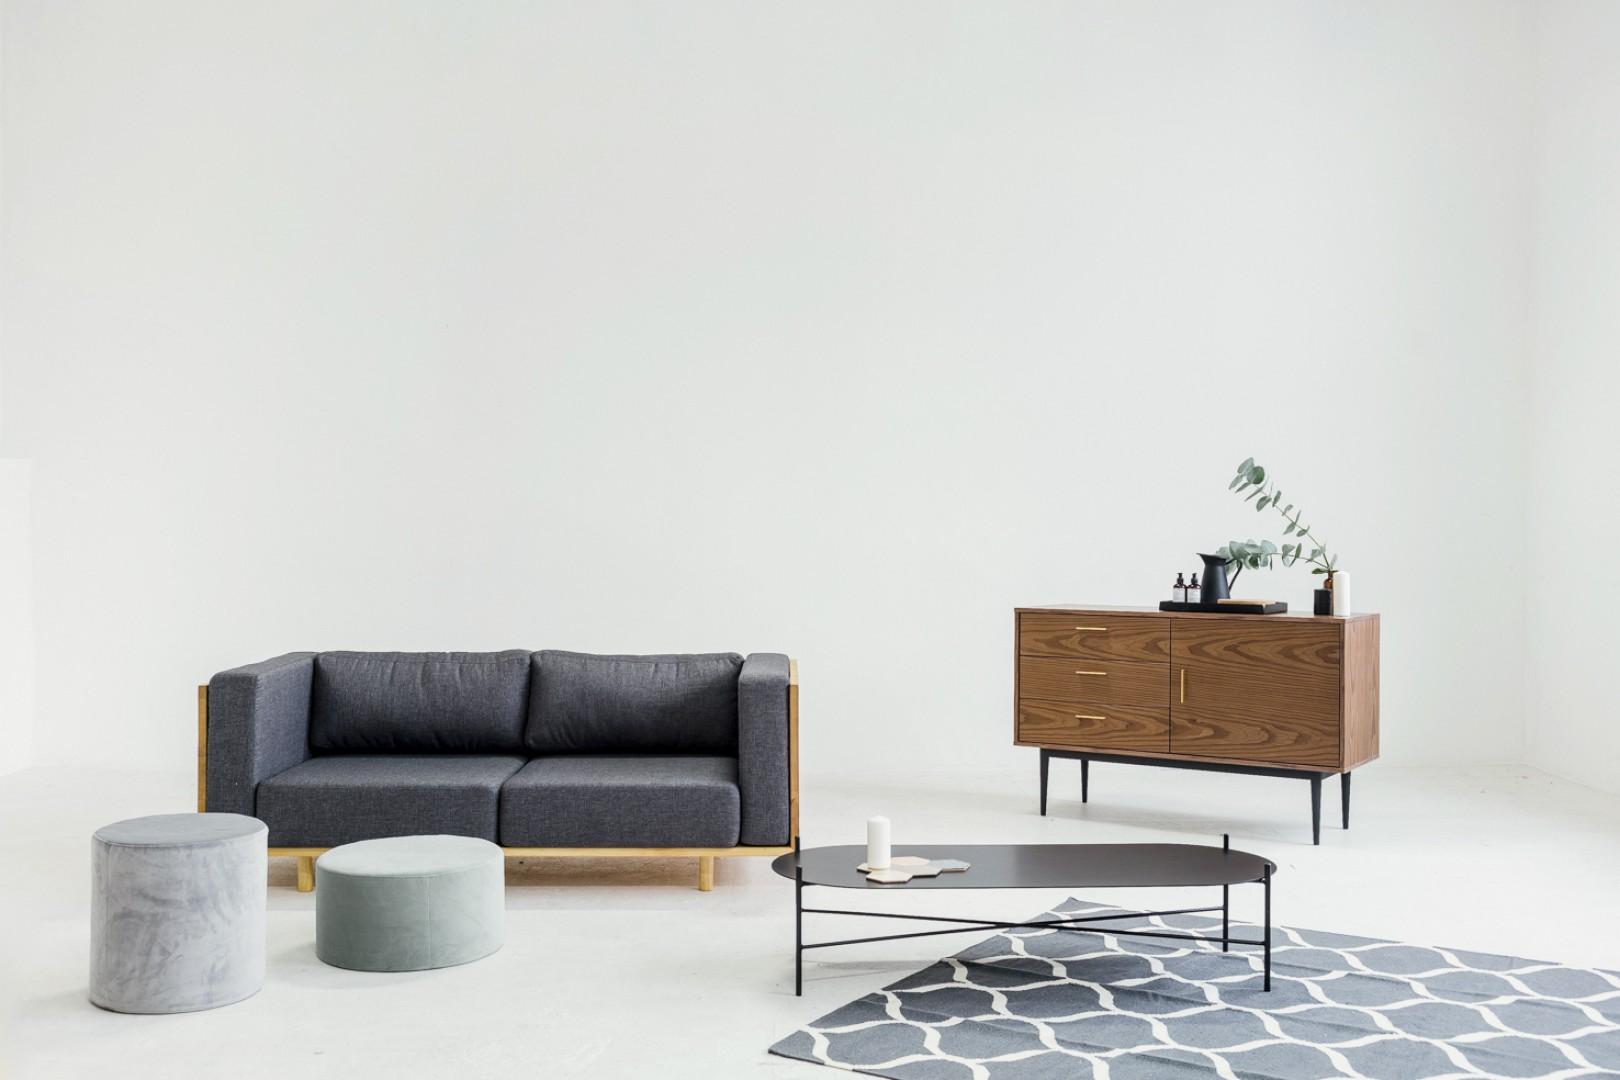 Sofa Mjuk z oferty startupu noo.ma. Fot. noo.ma